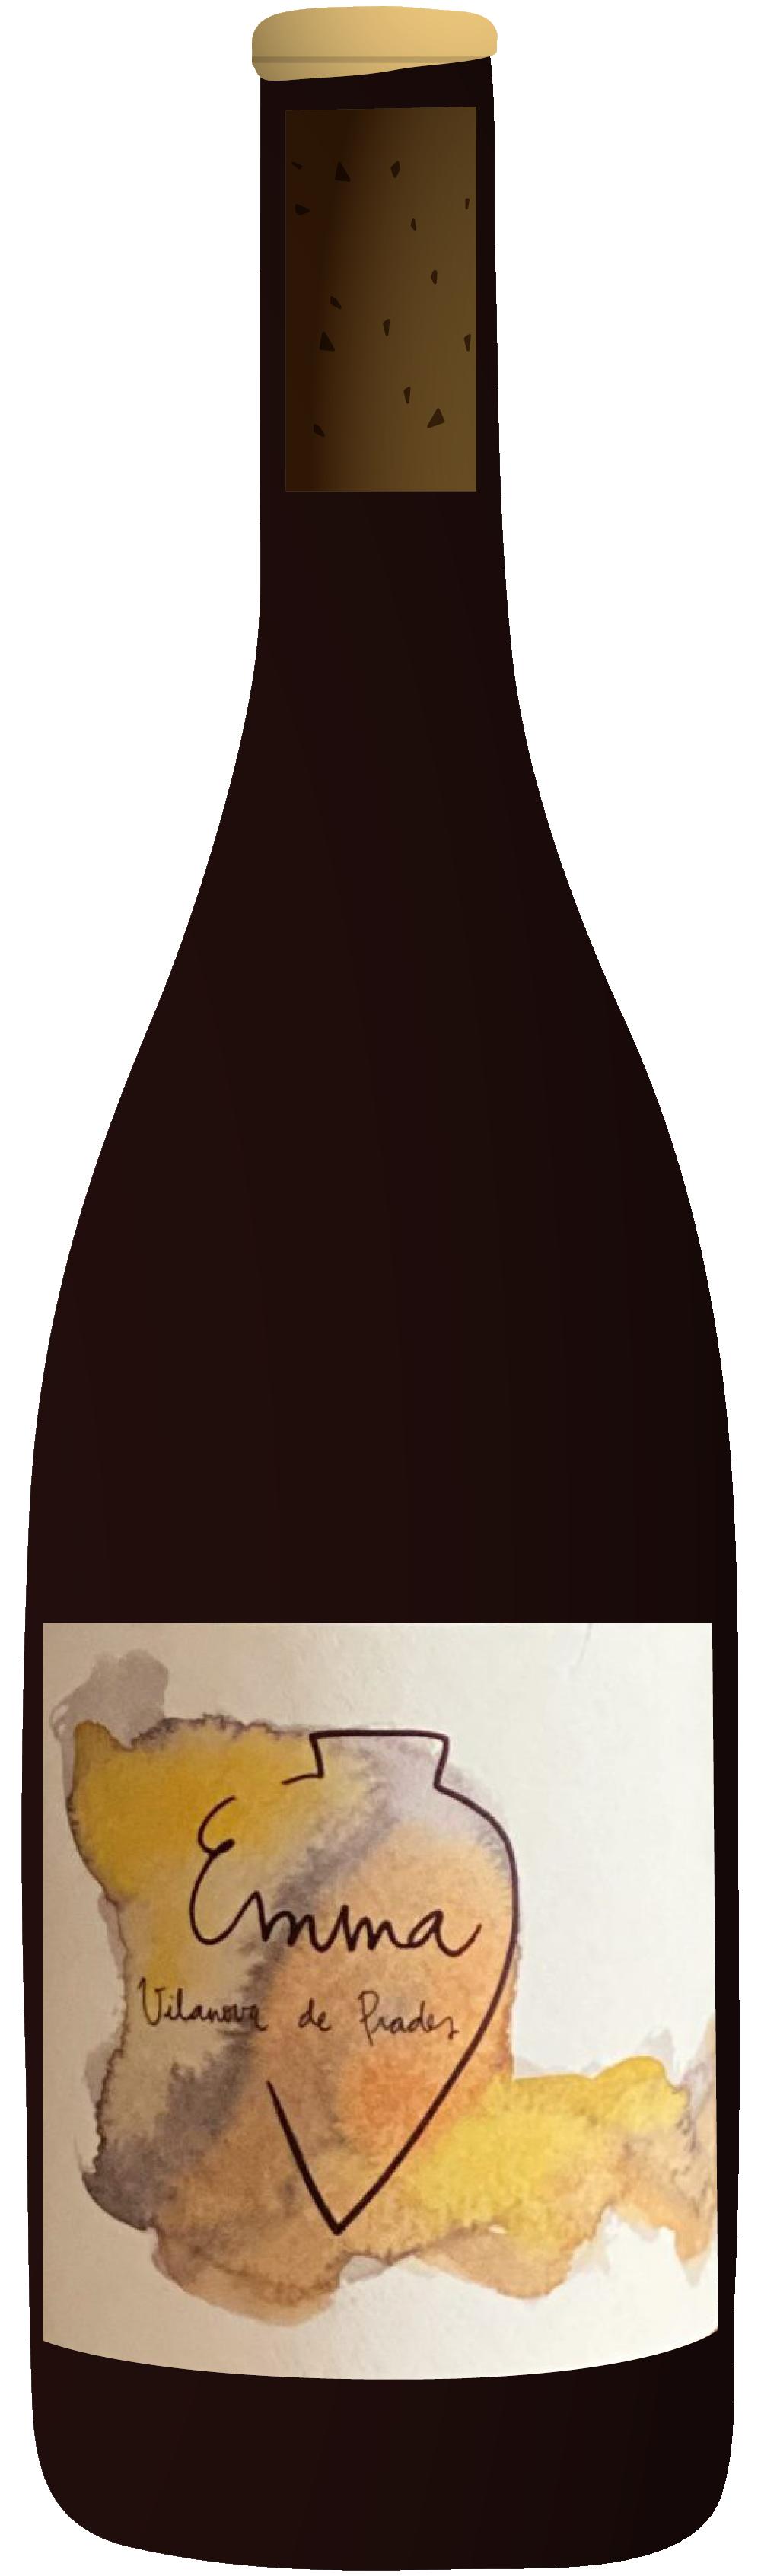 the natural wine company club may 2021 spain emma vilanova de prades 2018